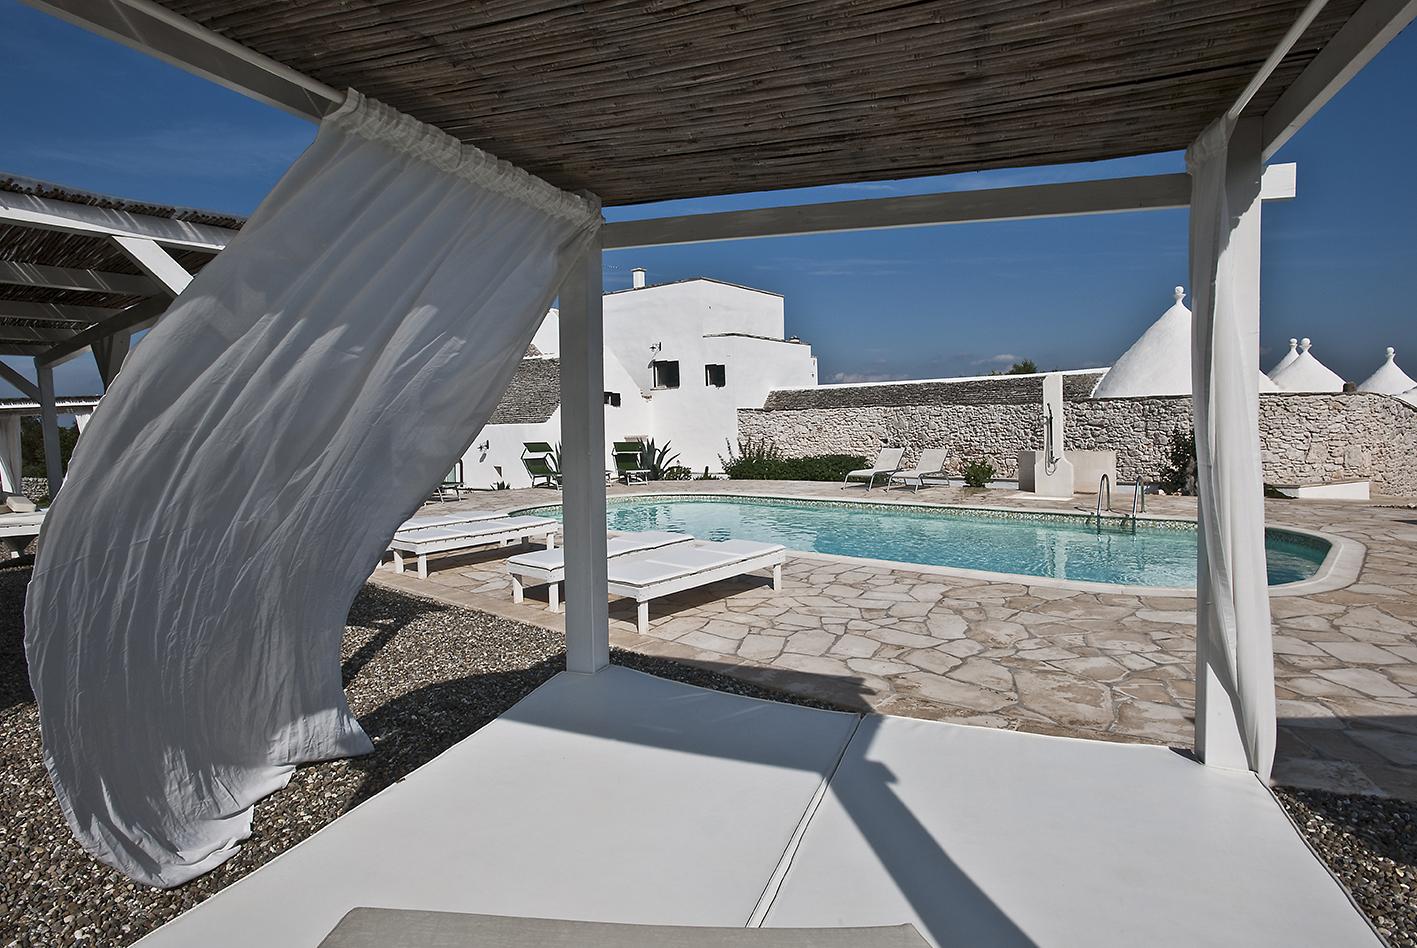 Swimming pool. Kava Yoga Retreat. Puglia, Italy 2019